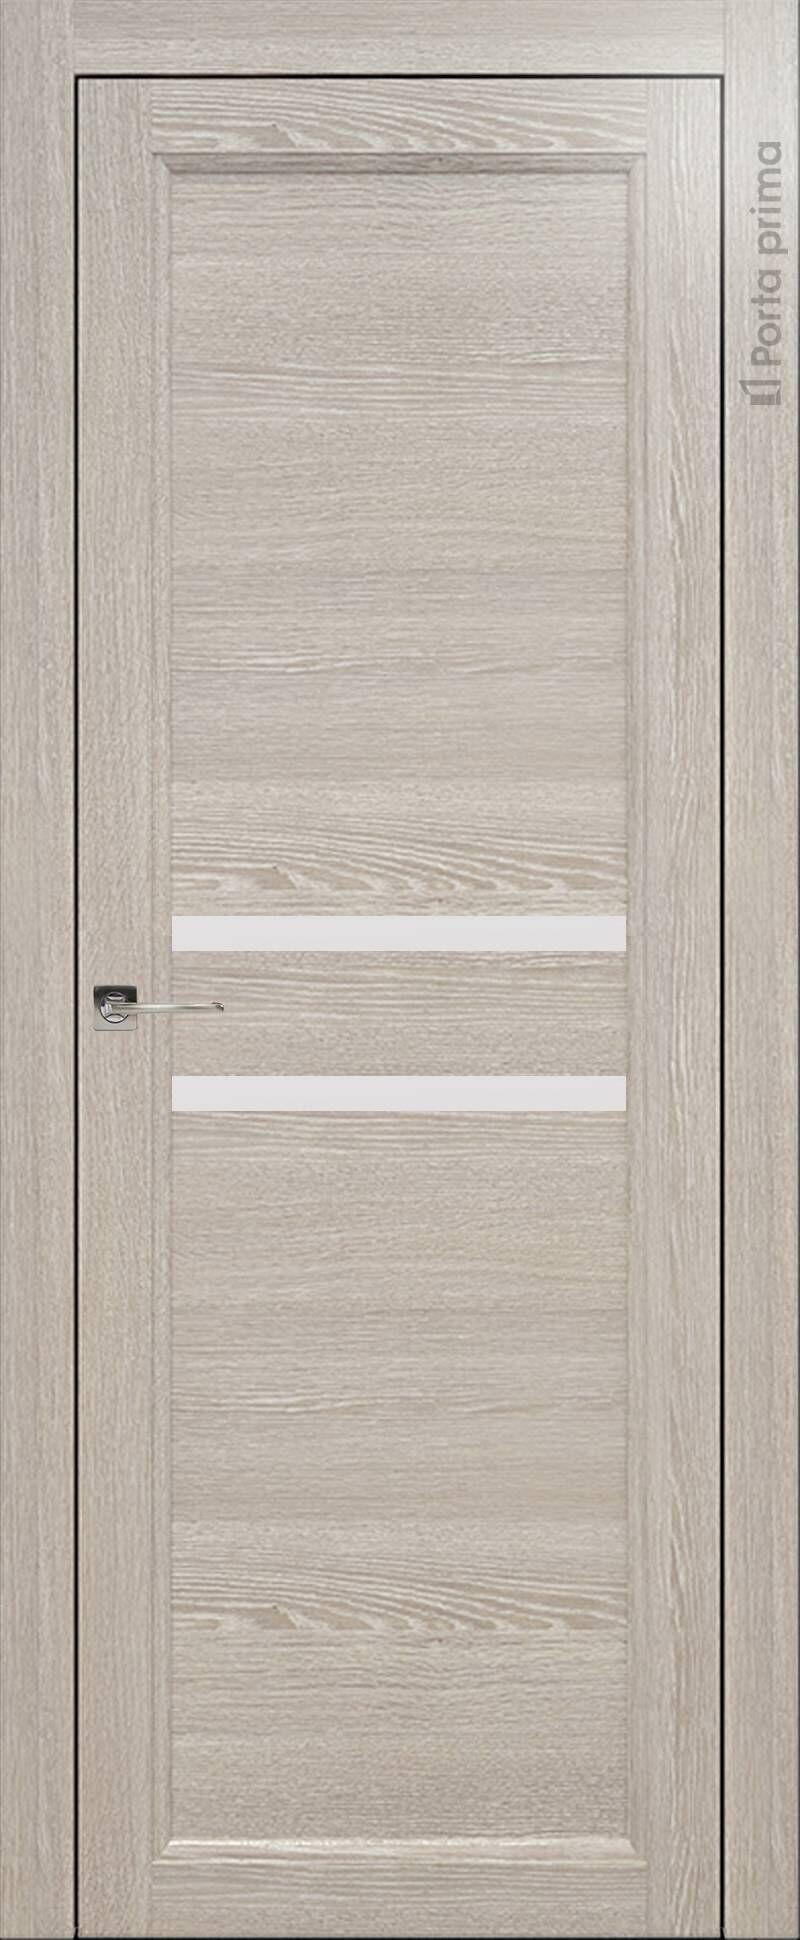 Sorrento-R В3 цвет - Серый дуб Без стекла (ДГ)